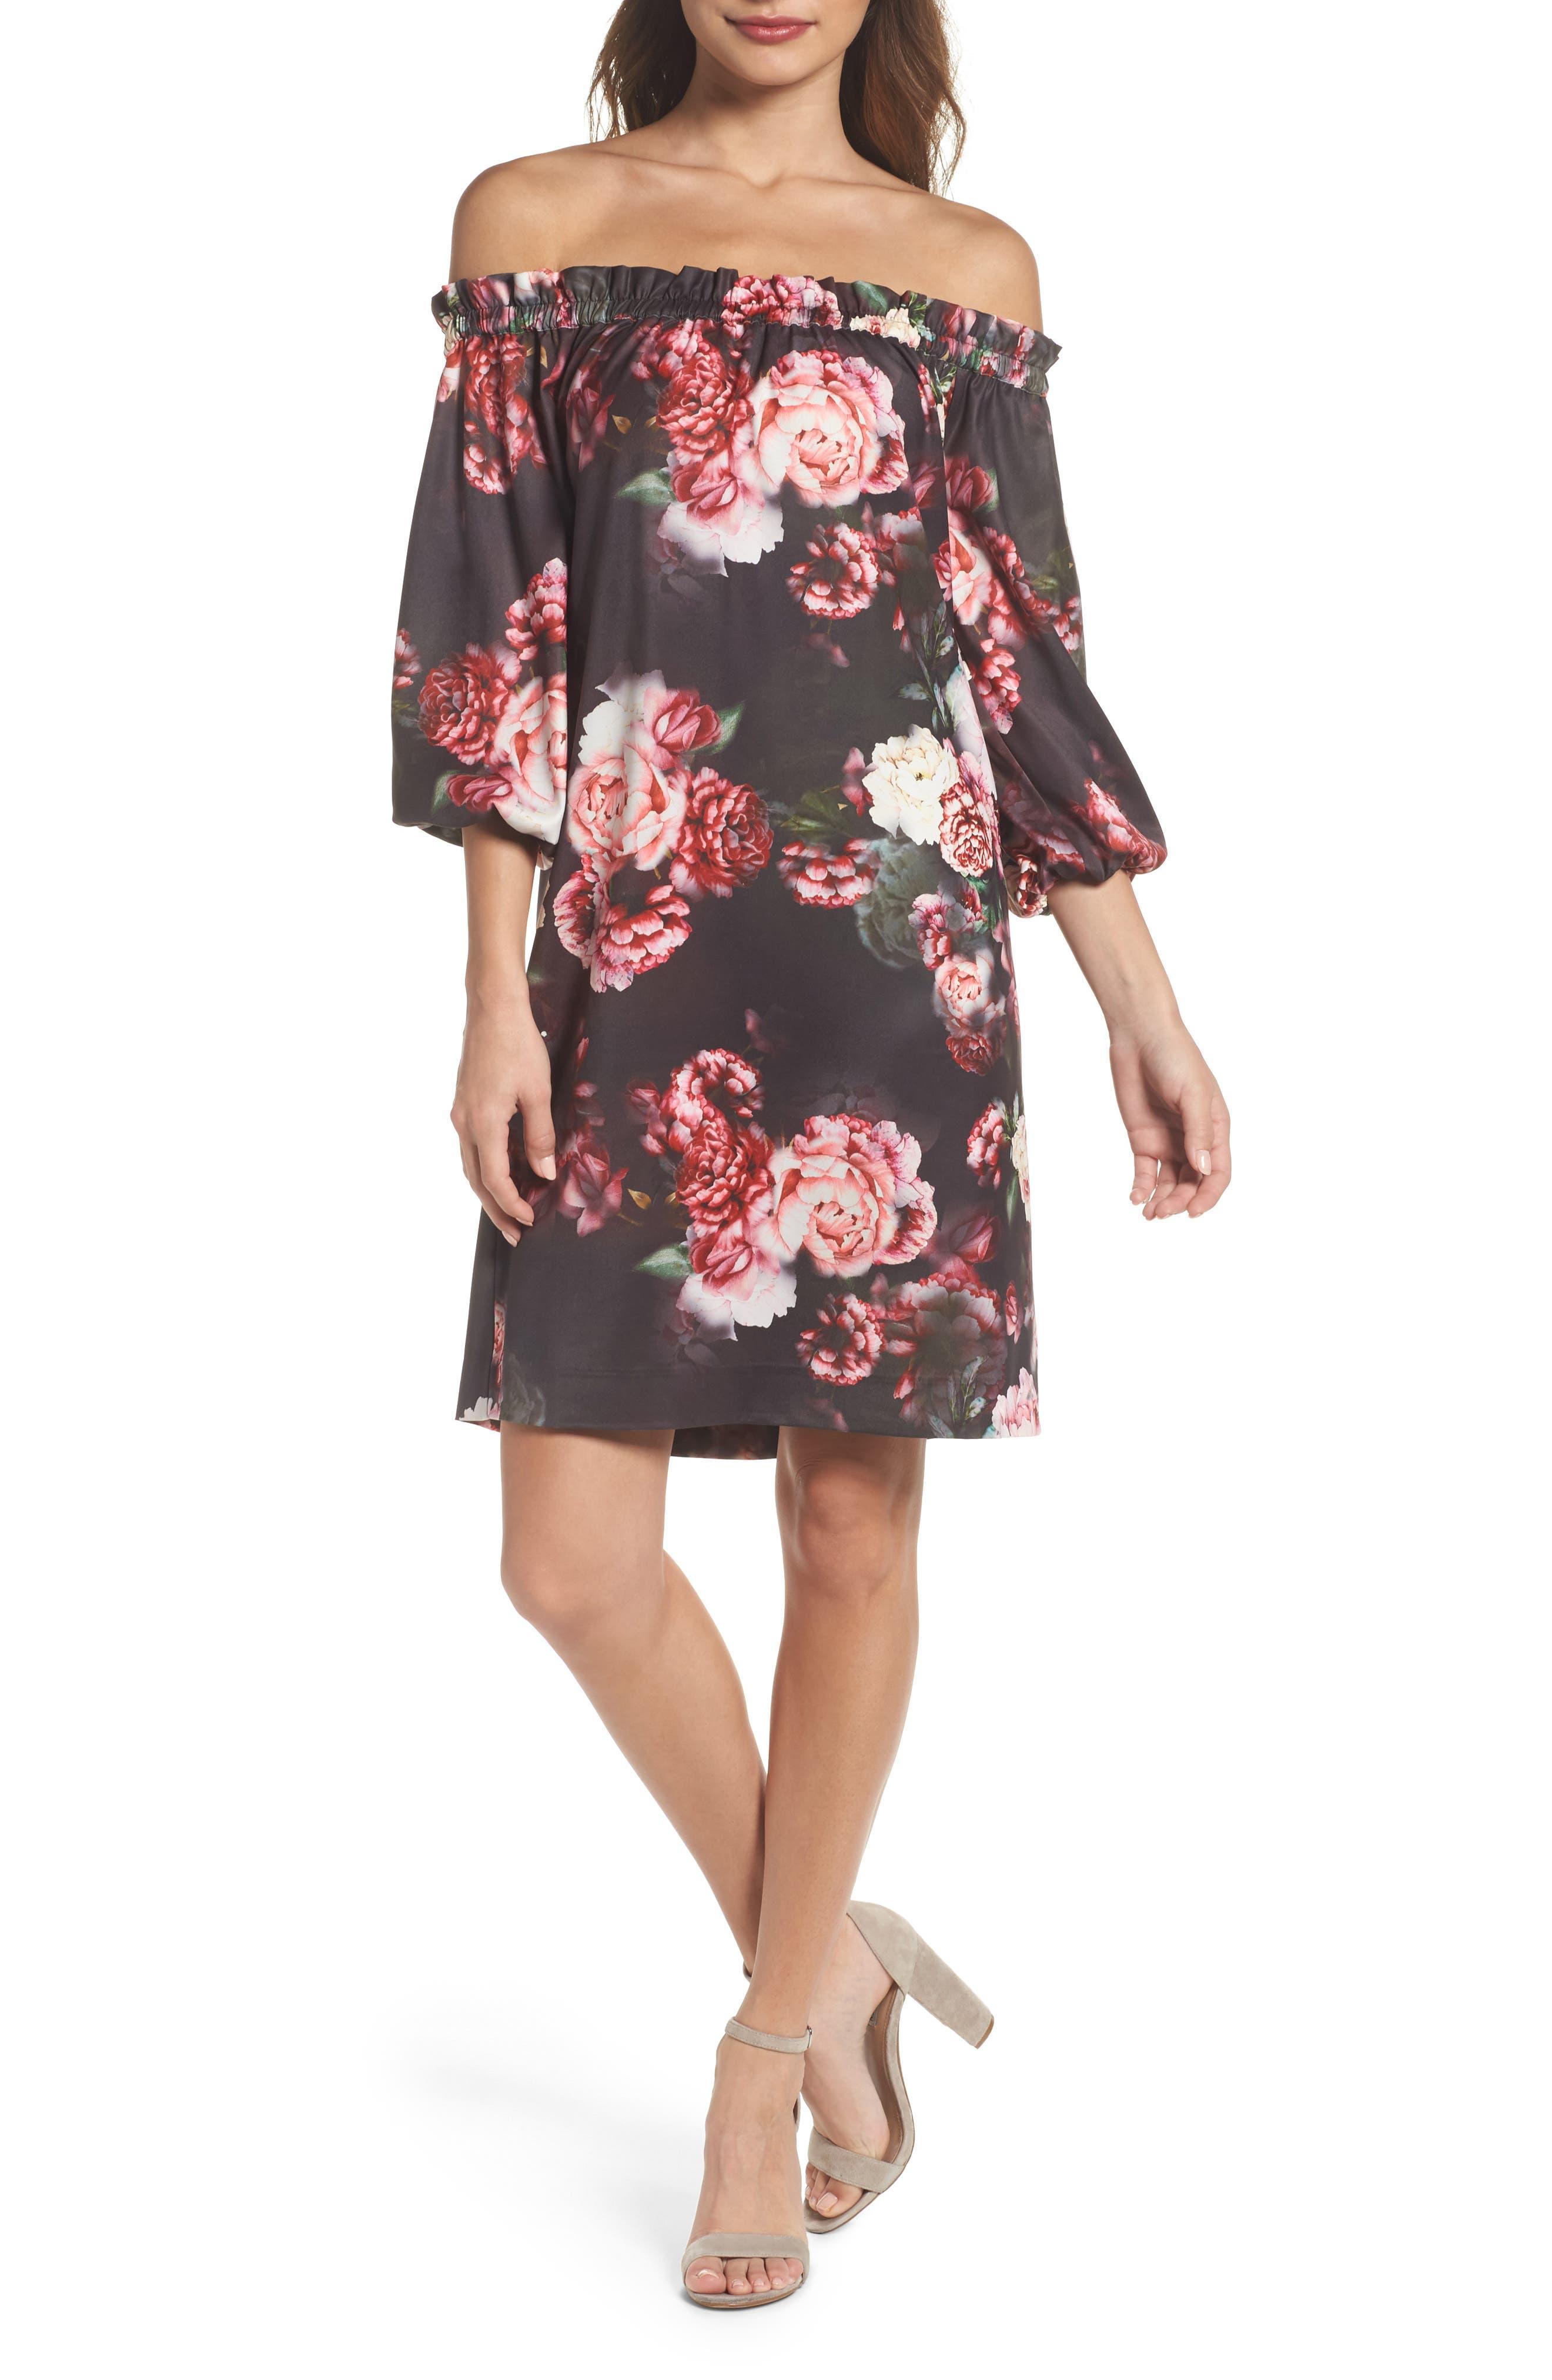 Alternate Image 1 Selected - Felicity & Coco Print Off the Shoulder Shift Dress (Regular & Petite) (Nordstrom Exclusive)